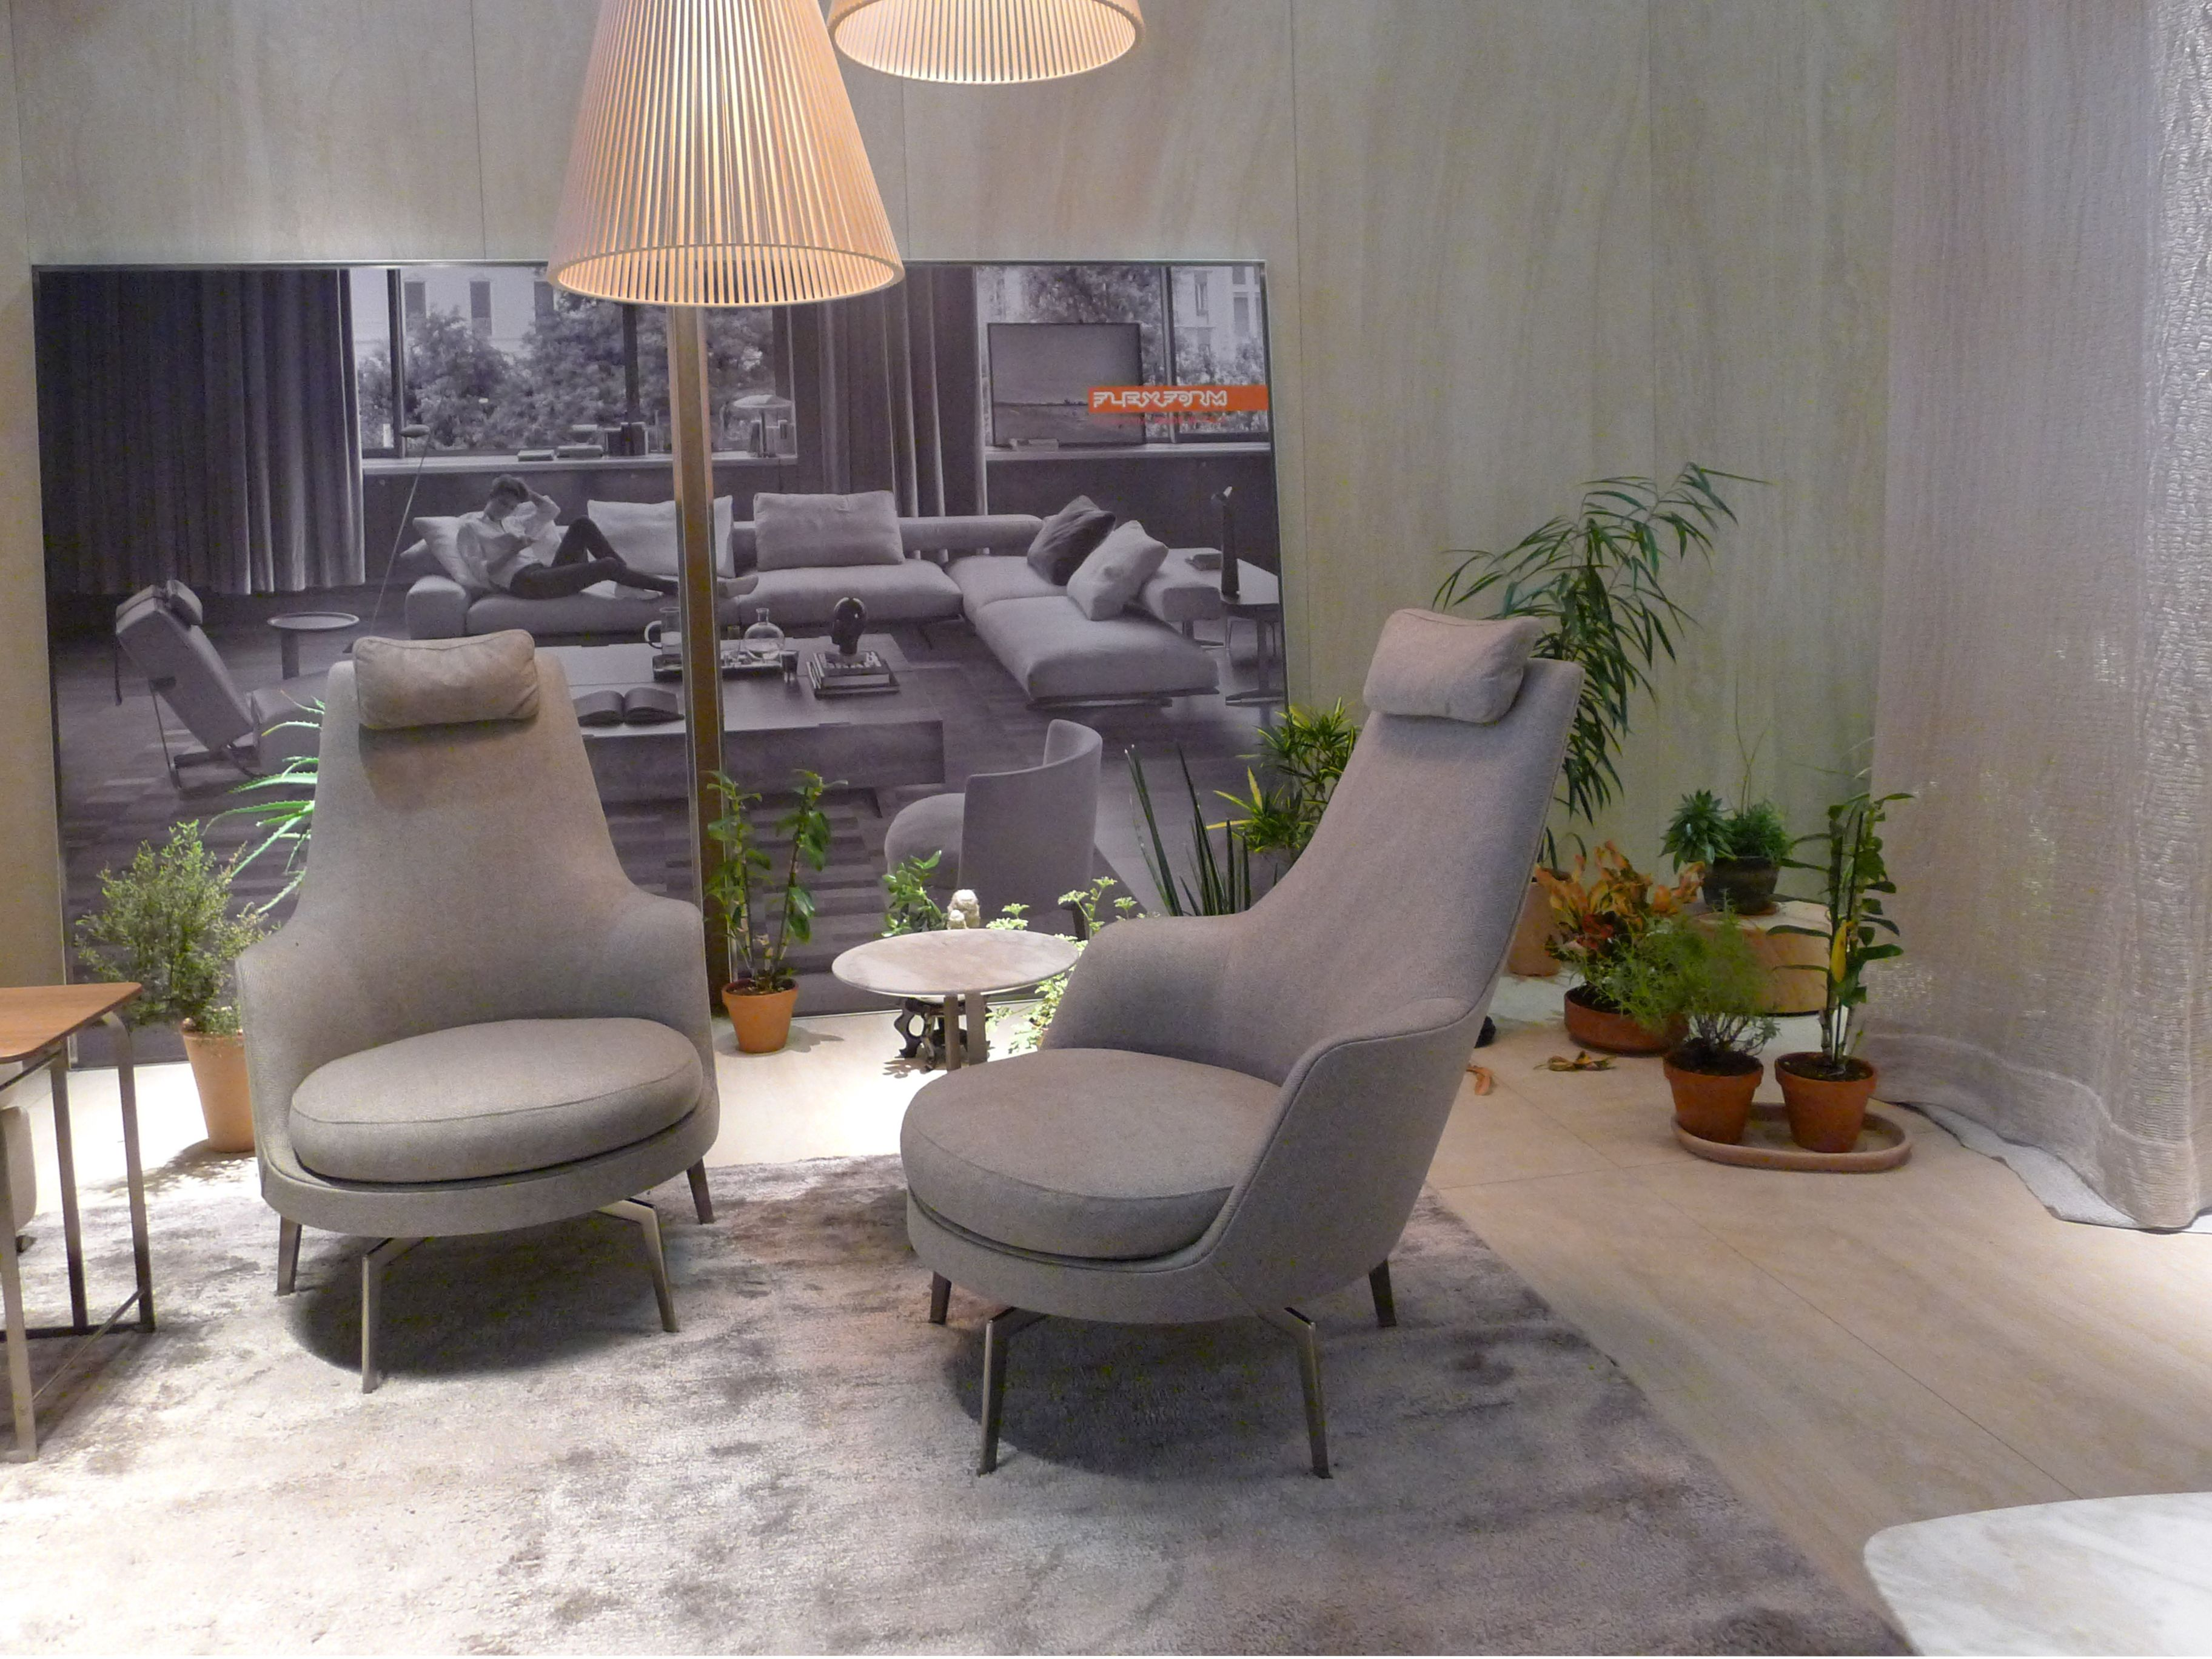 2015 salonemobili milano #myflexform #guscioalto #wohnidee luzern ...